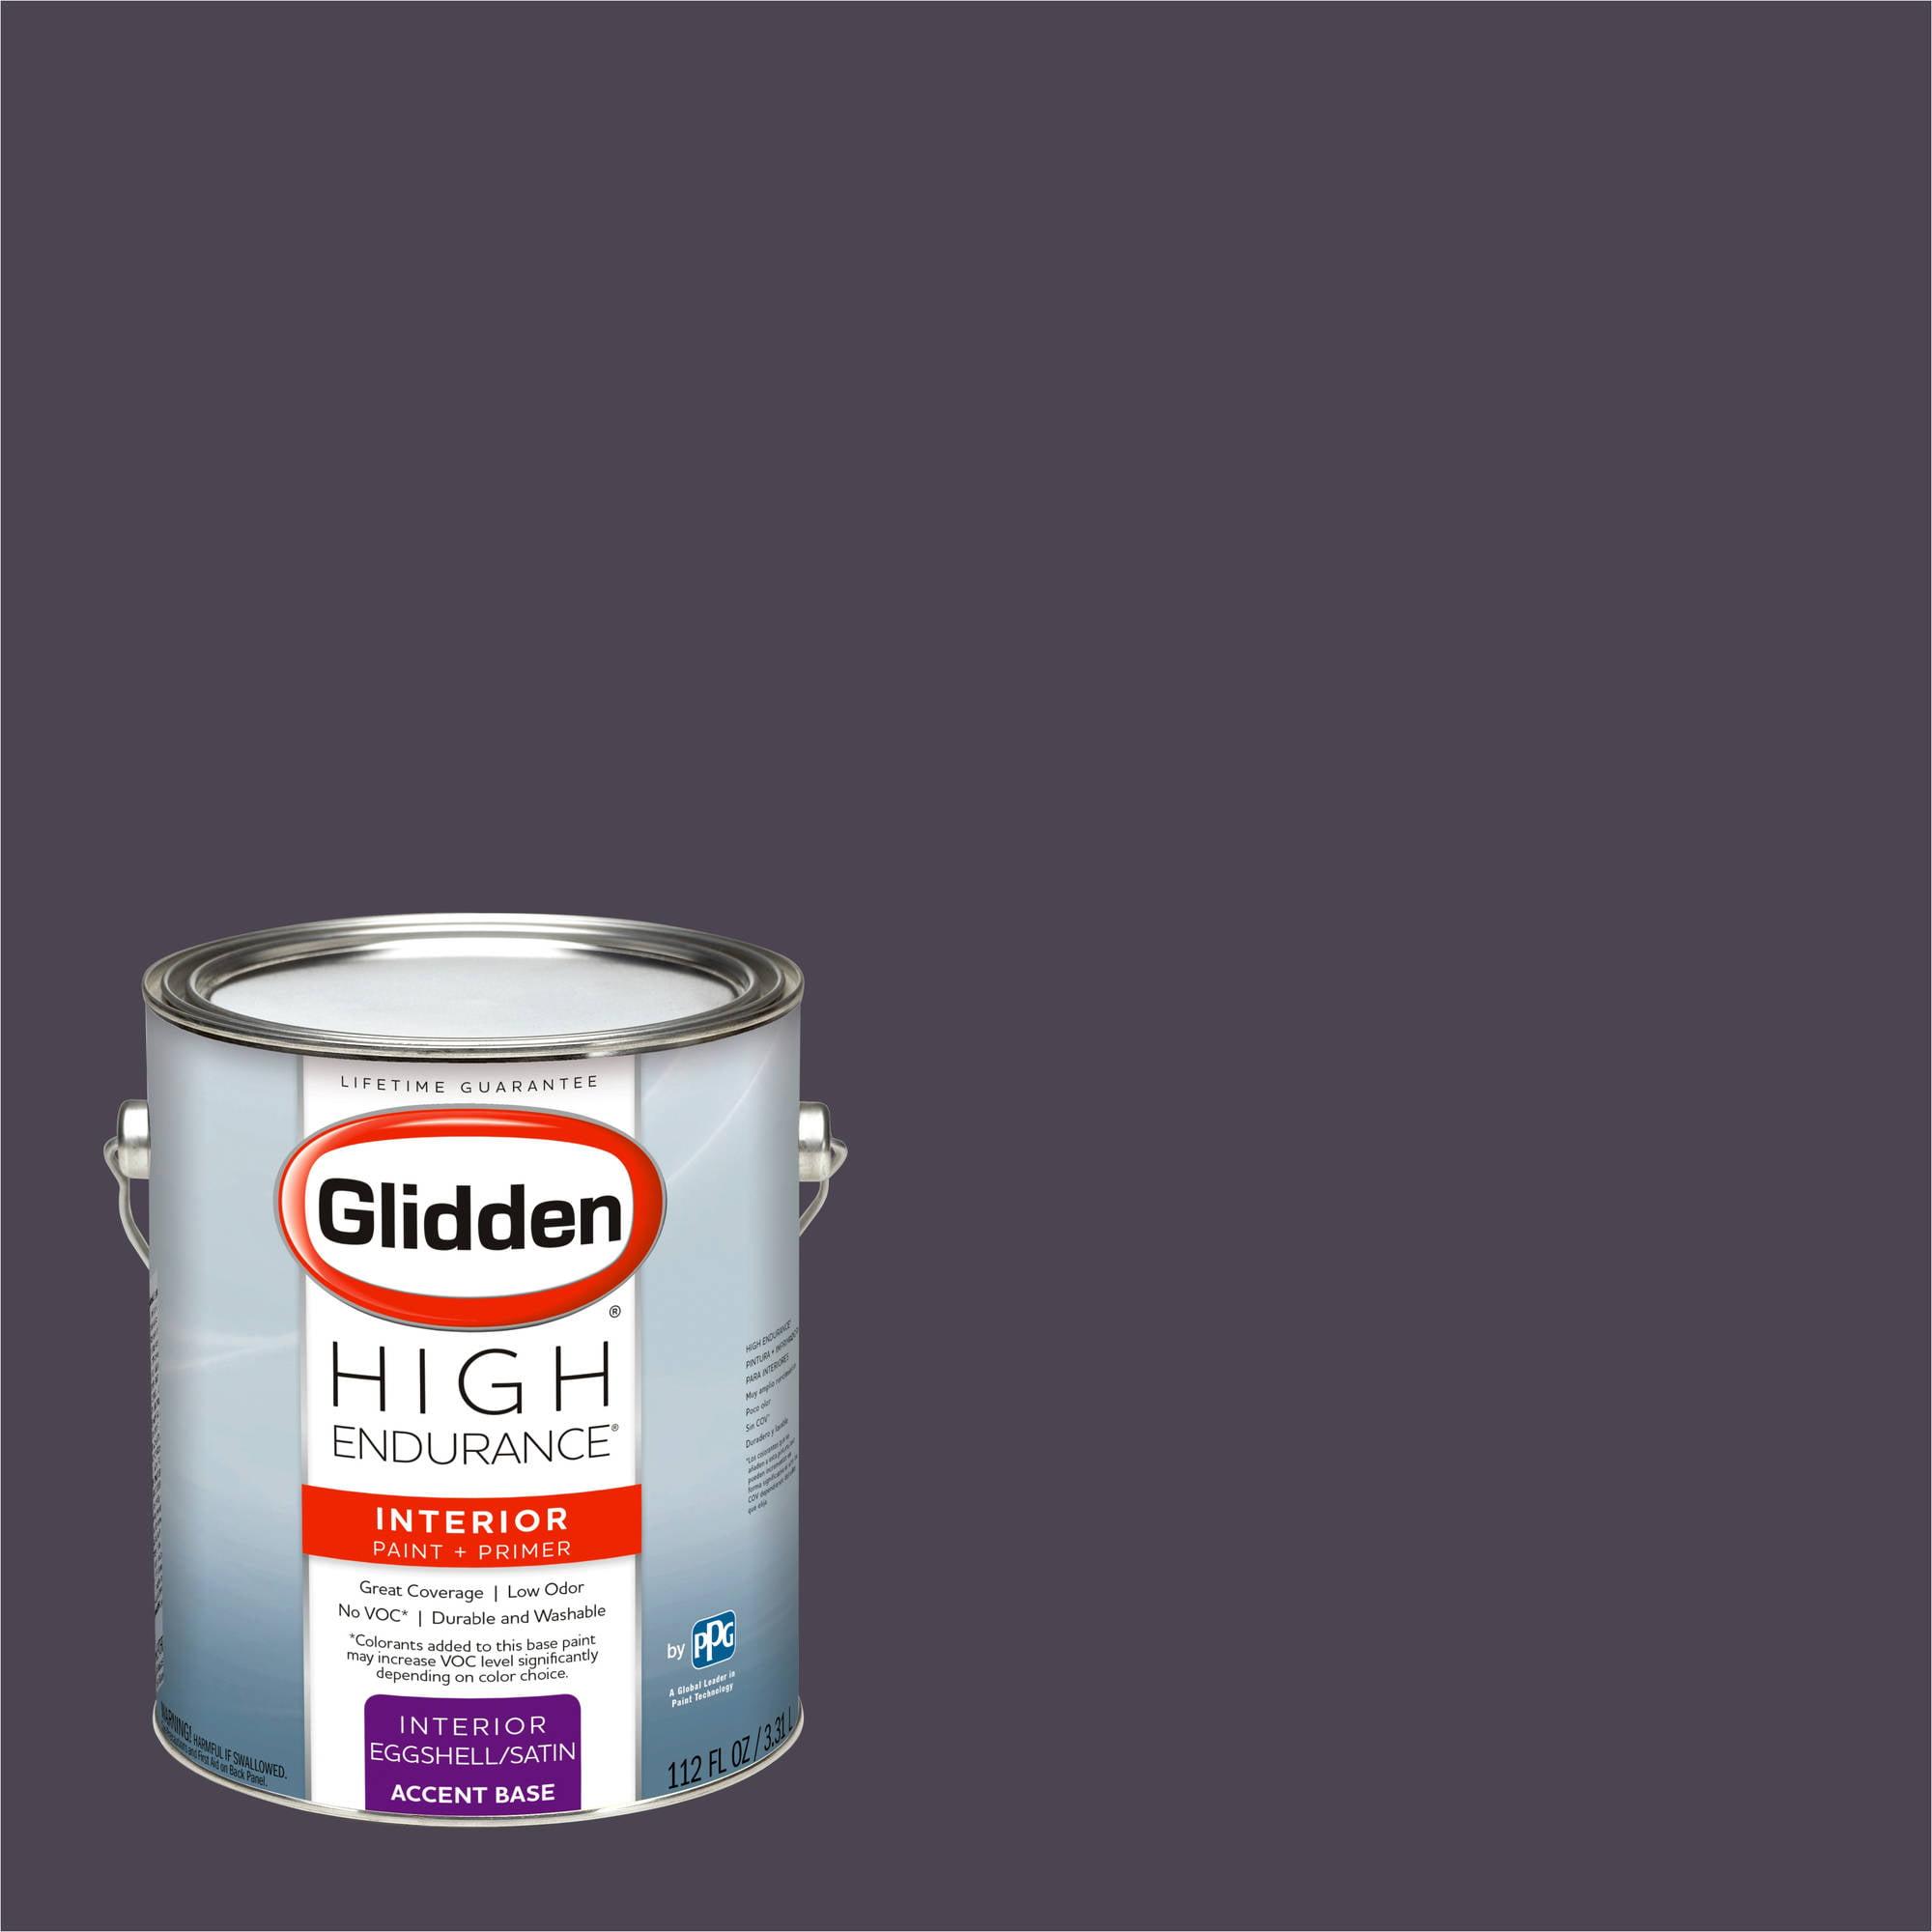 Glidden High Endurance, Interior Paint and Primer, Black Amethyst, # 30RB 07/071